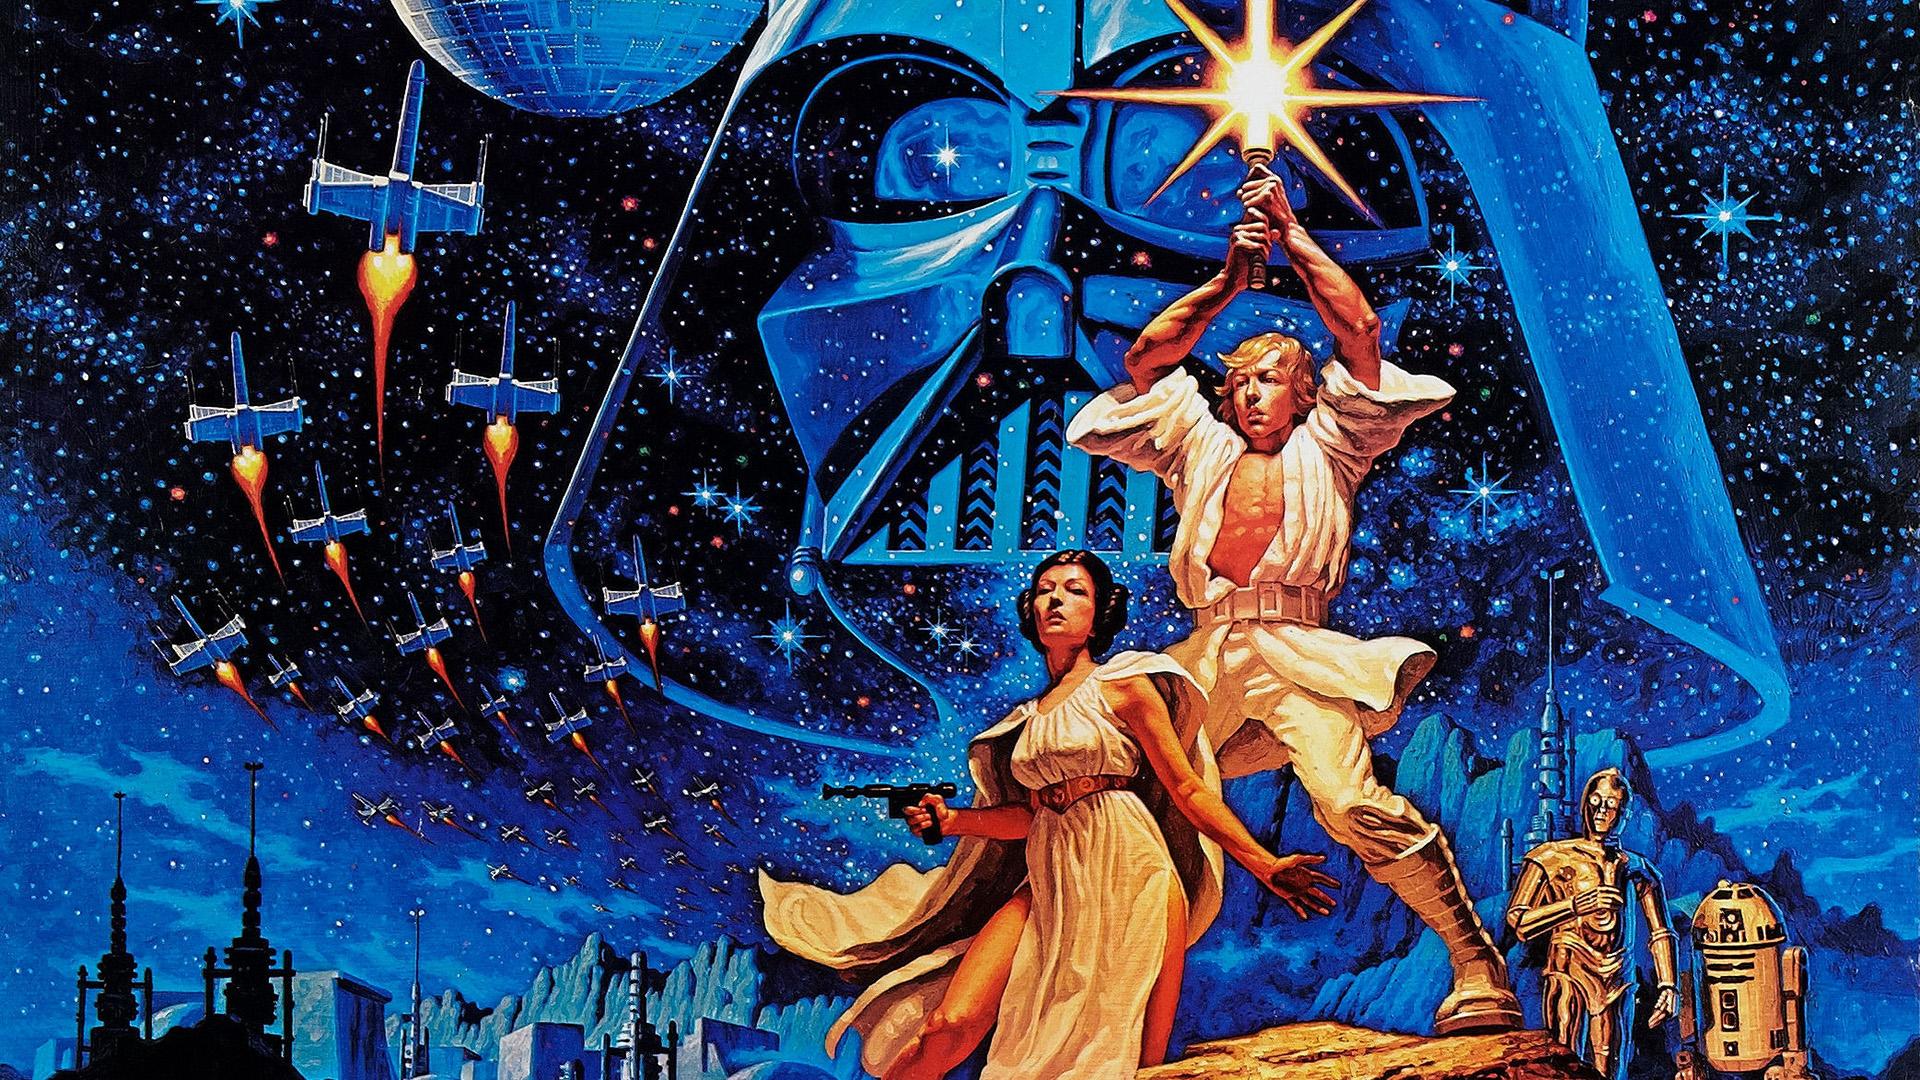 191 1915962 star wars original trilogy aesthetic